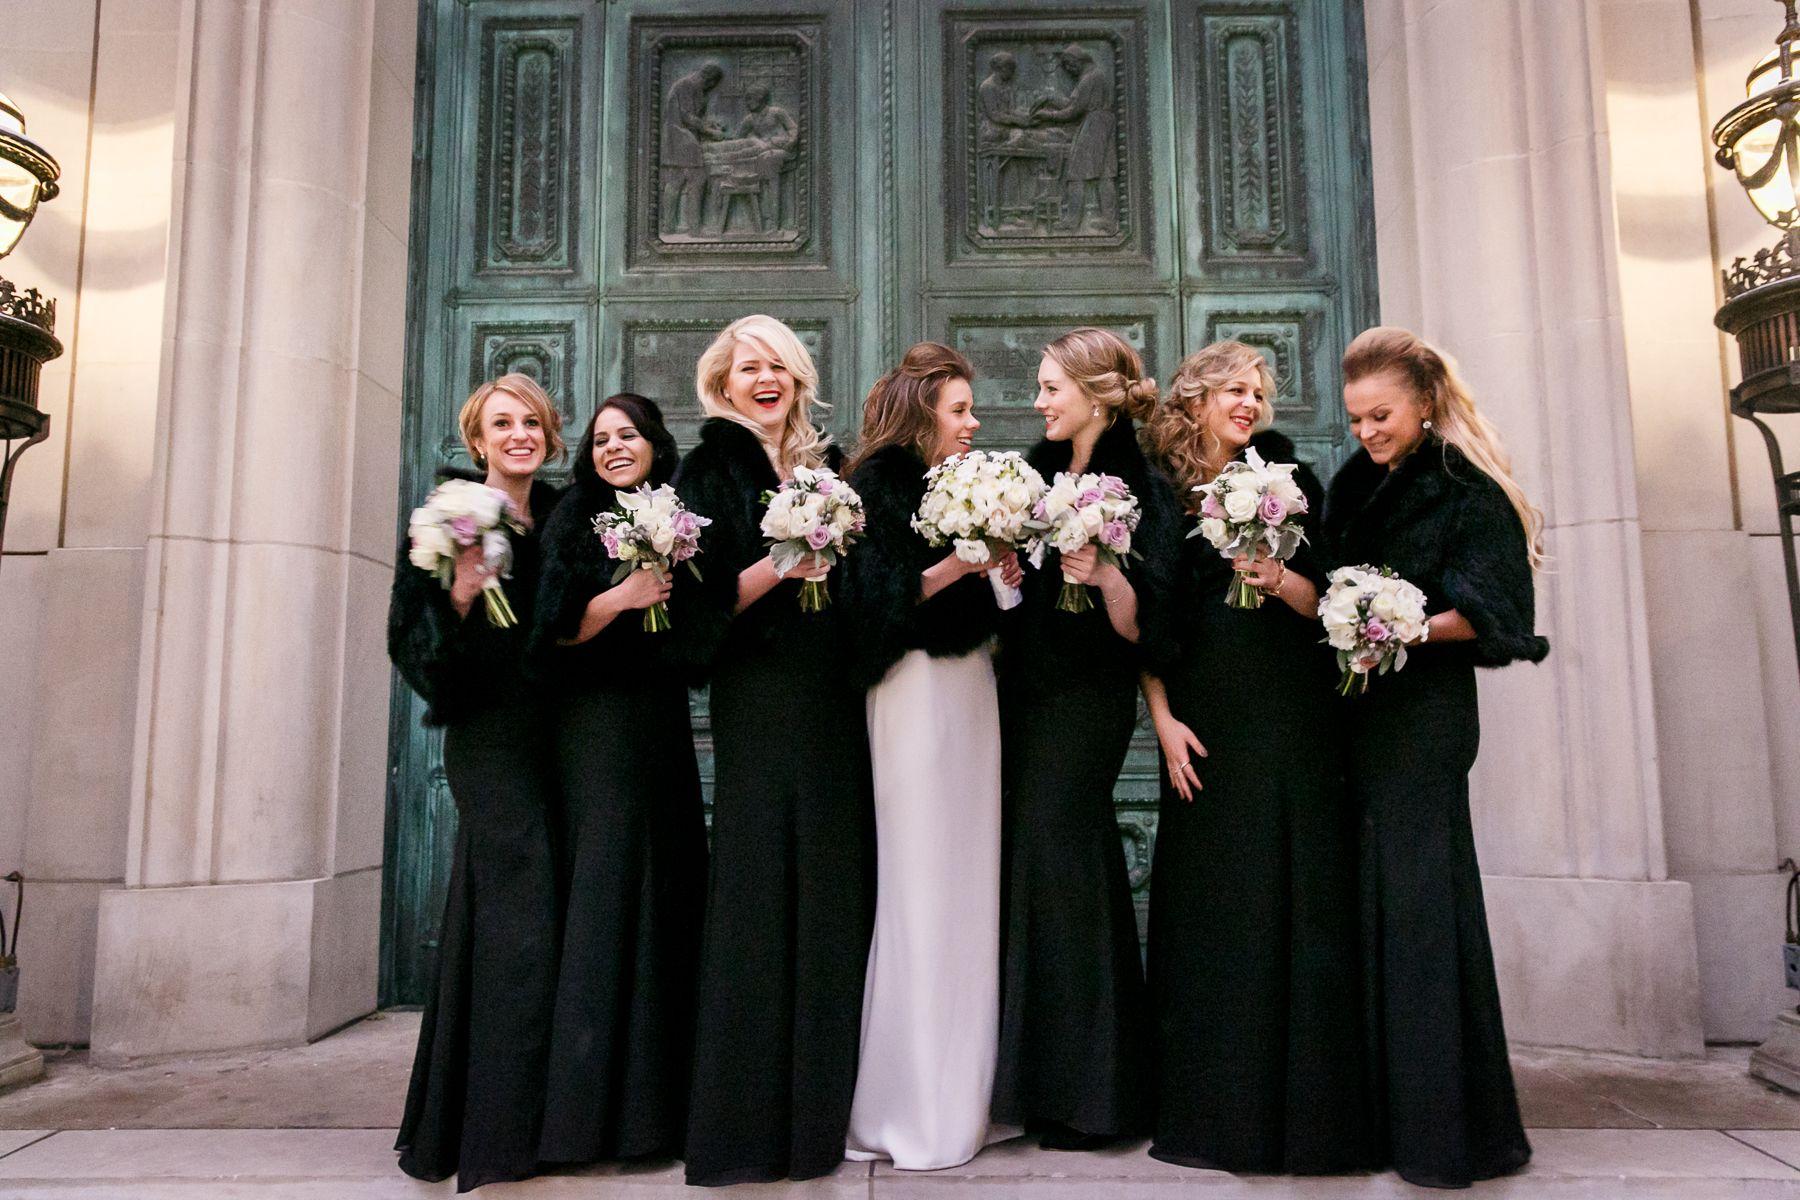 Black Bridesmaid Dresses with Fur Wraps Black bridesmaid